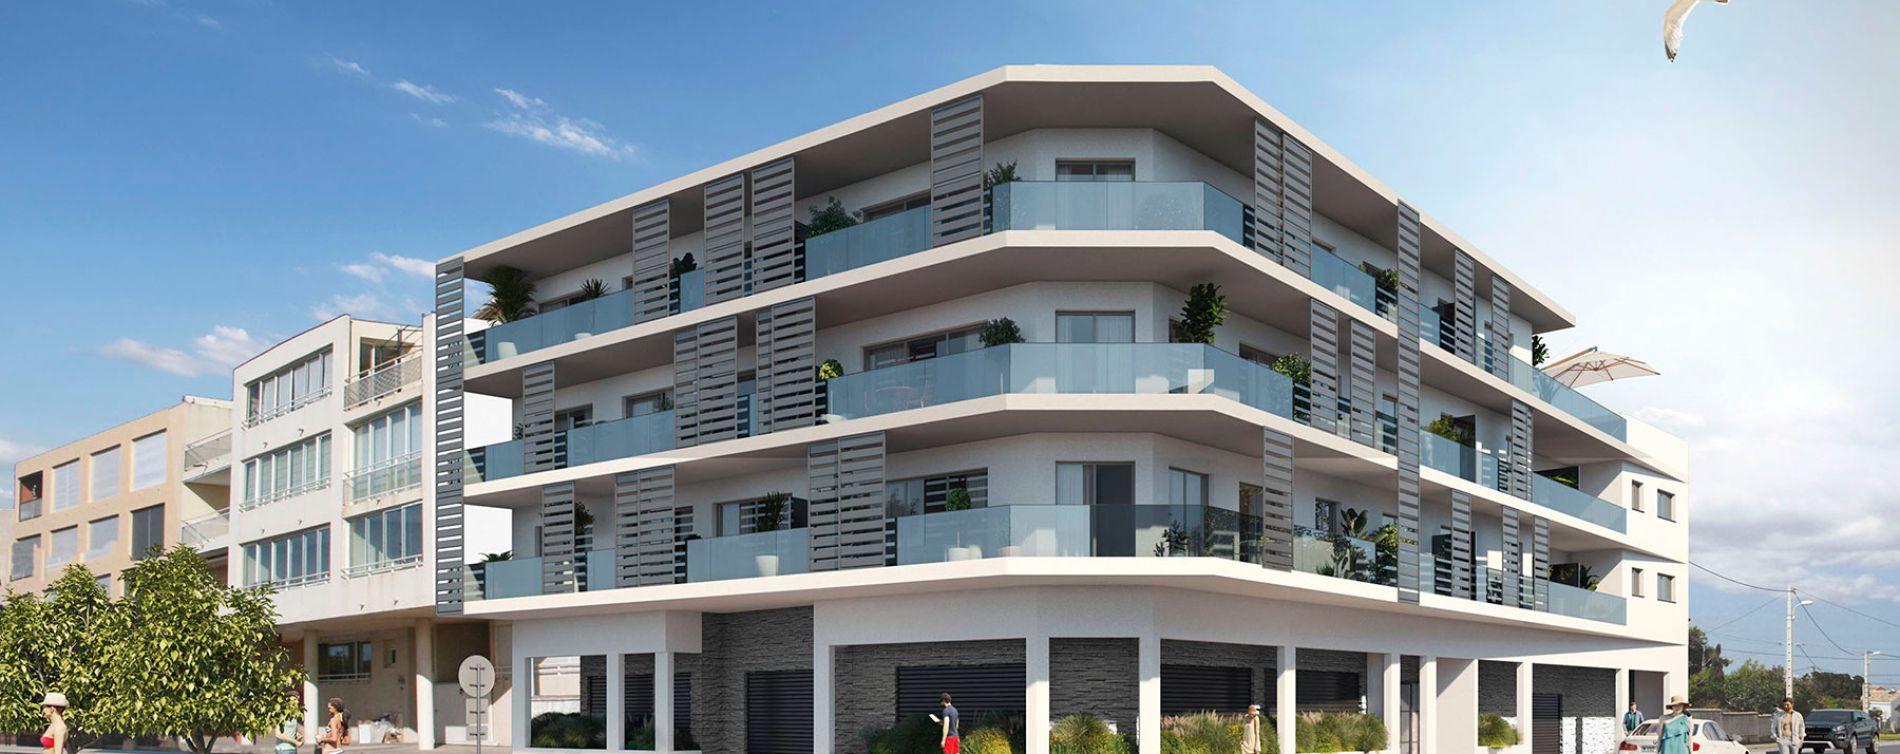 Résidence Villa Horizon à Agde